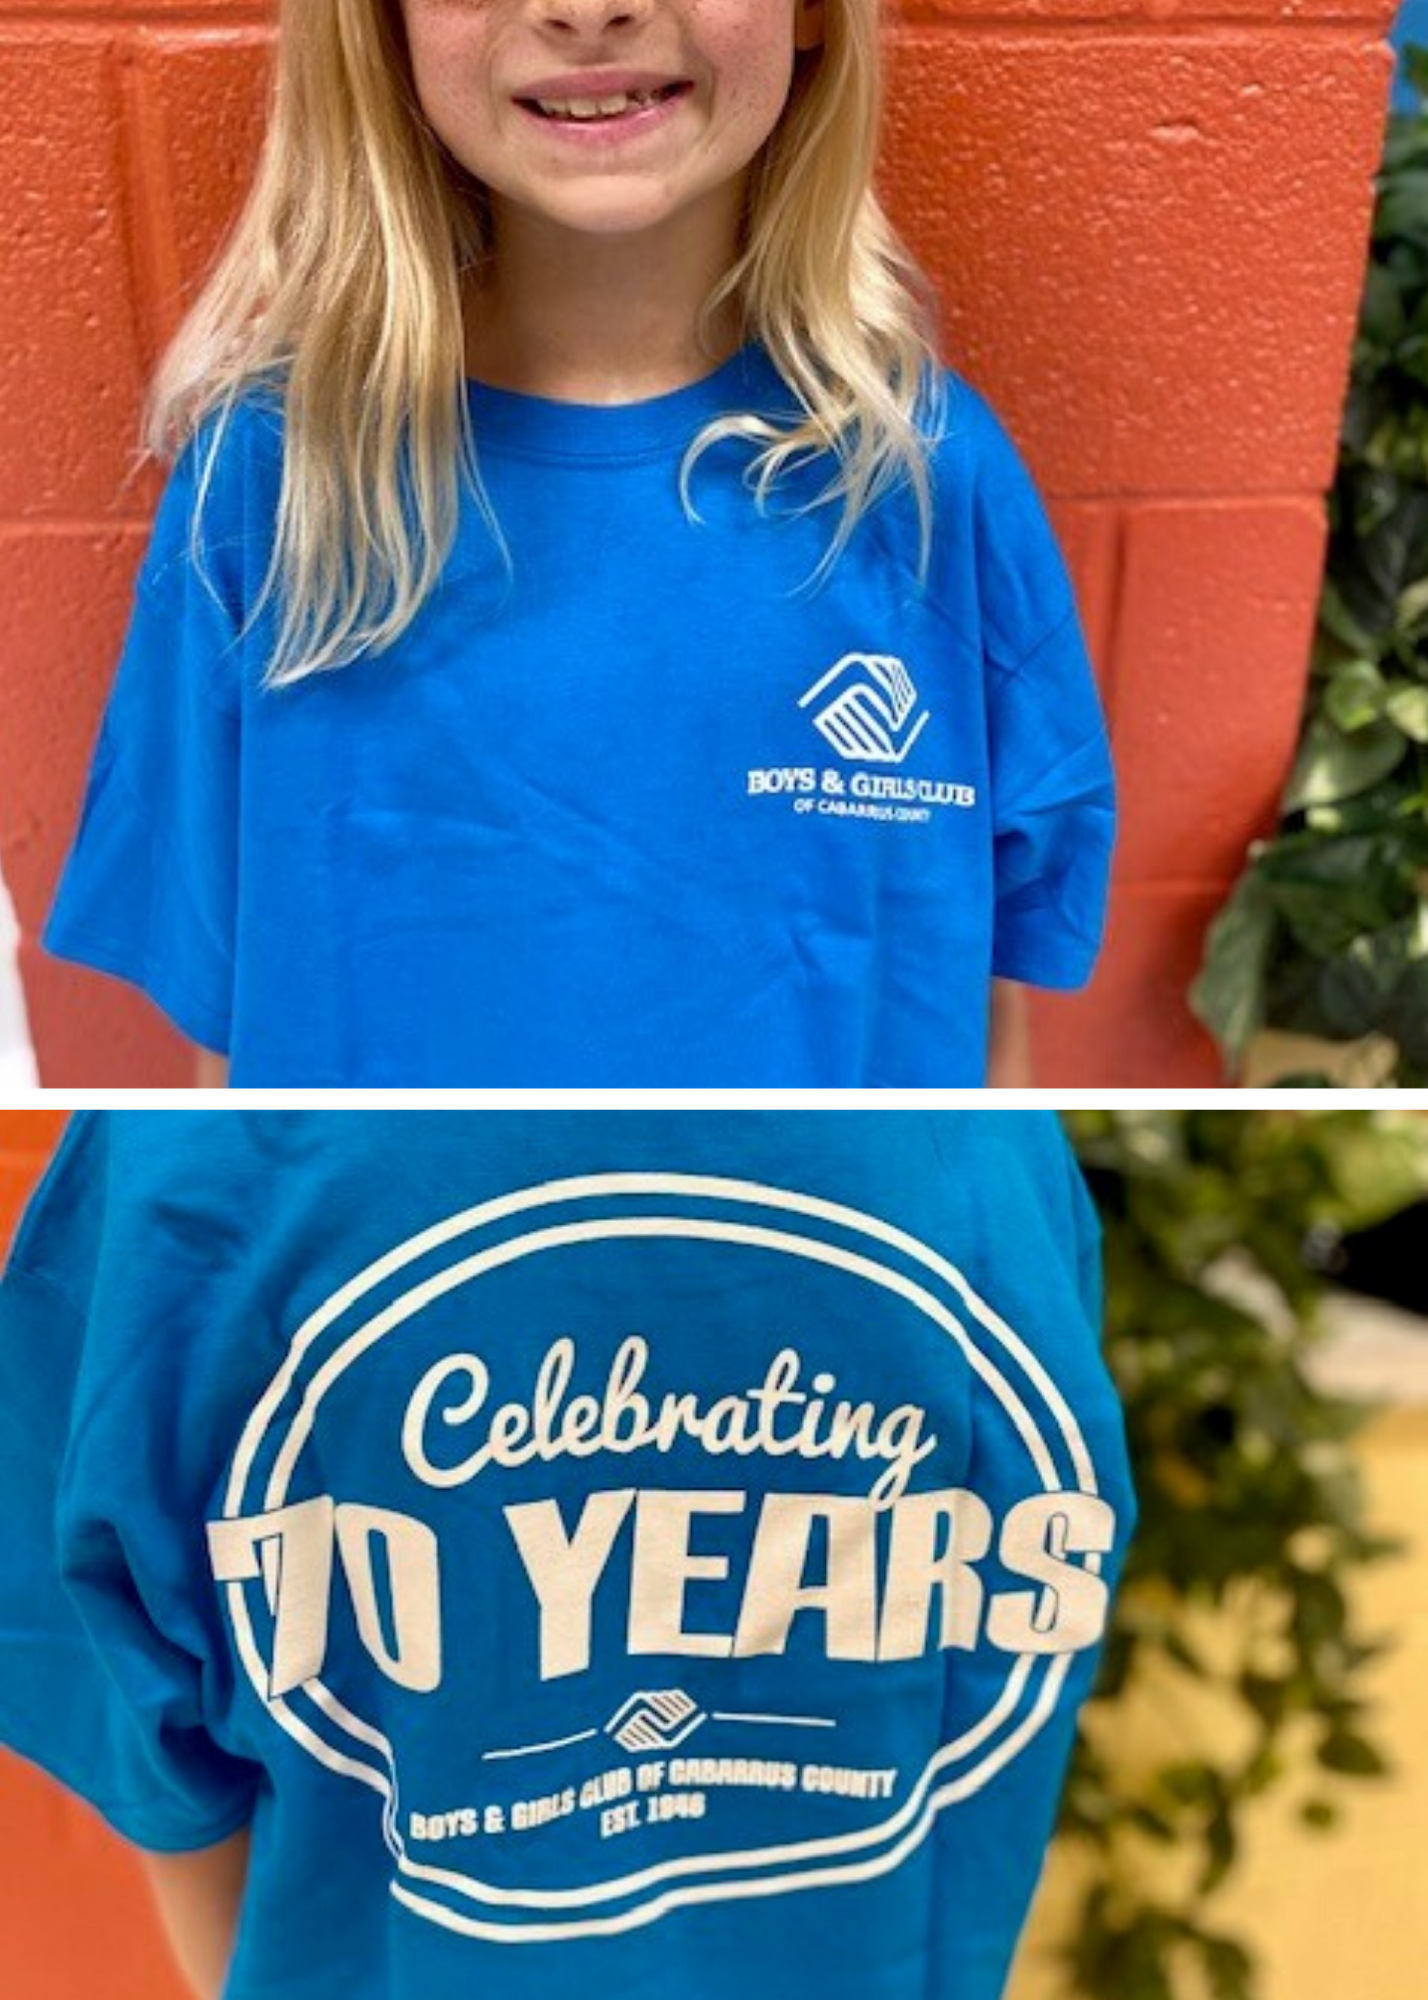 70th Club Anniversary Short Sleeve